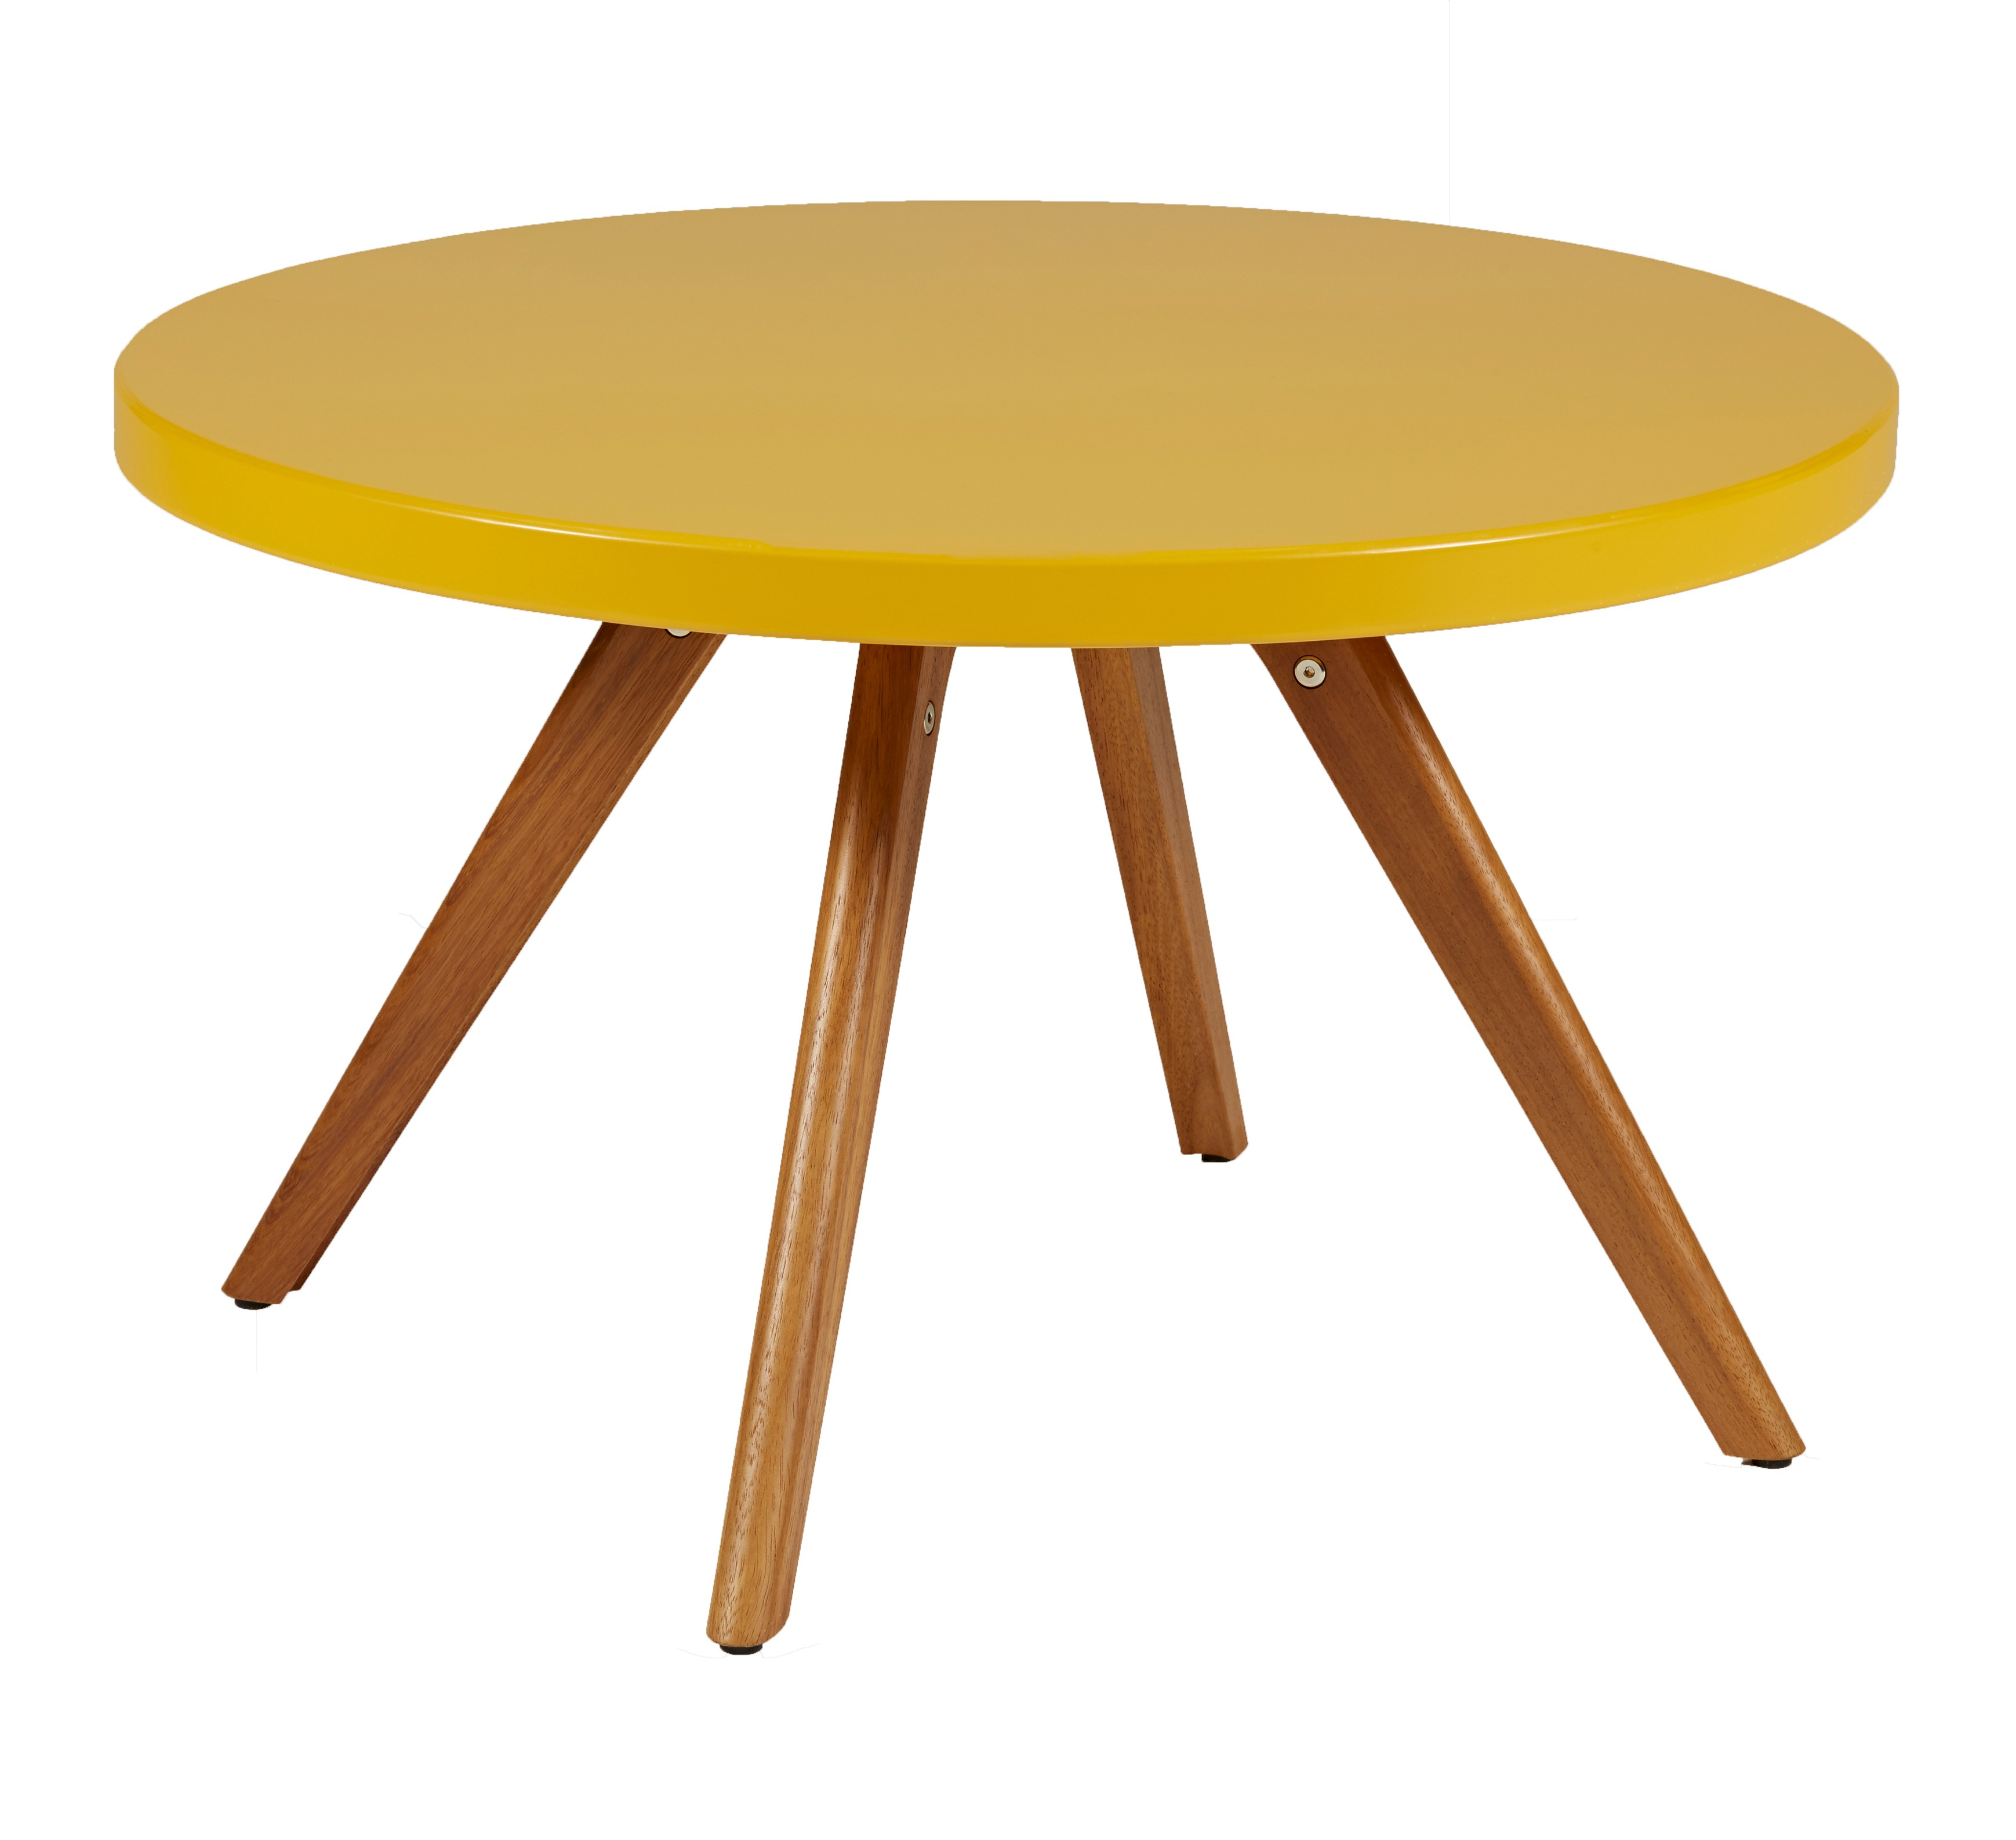 TABLE BASSE RONDE K17 INOX, Ø 80 cm, Jaune moutarde de TOLIX